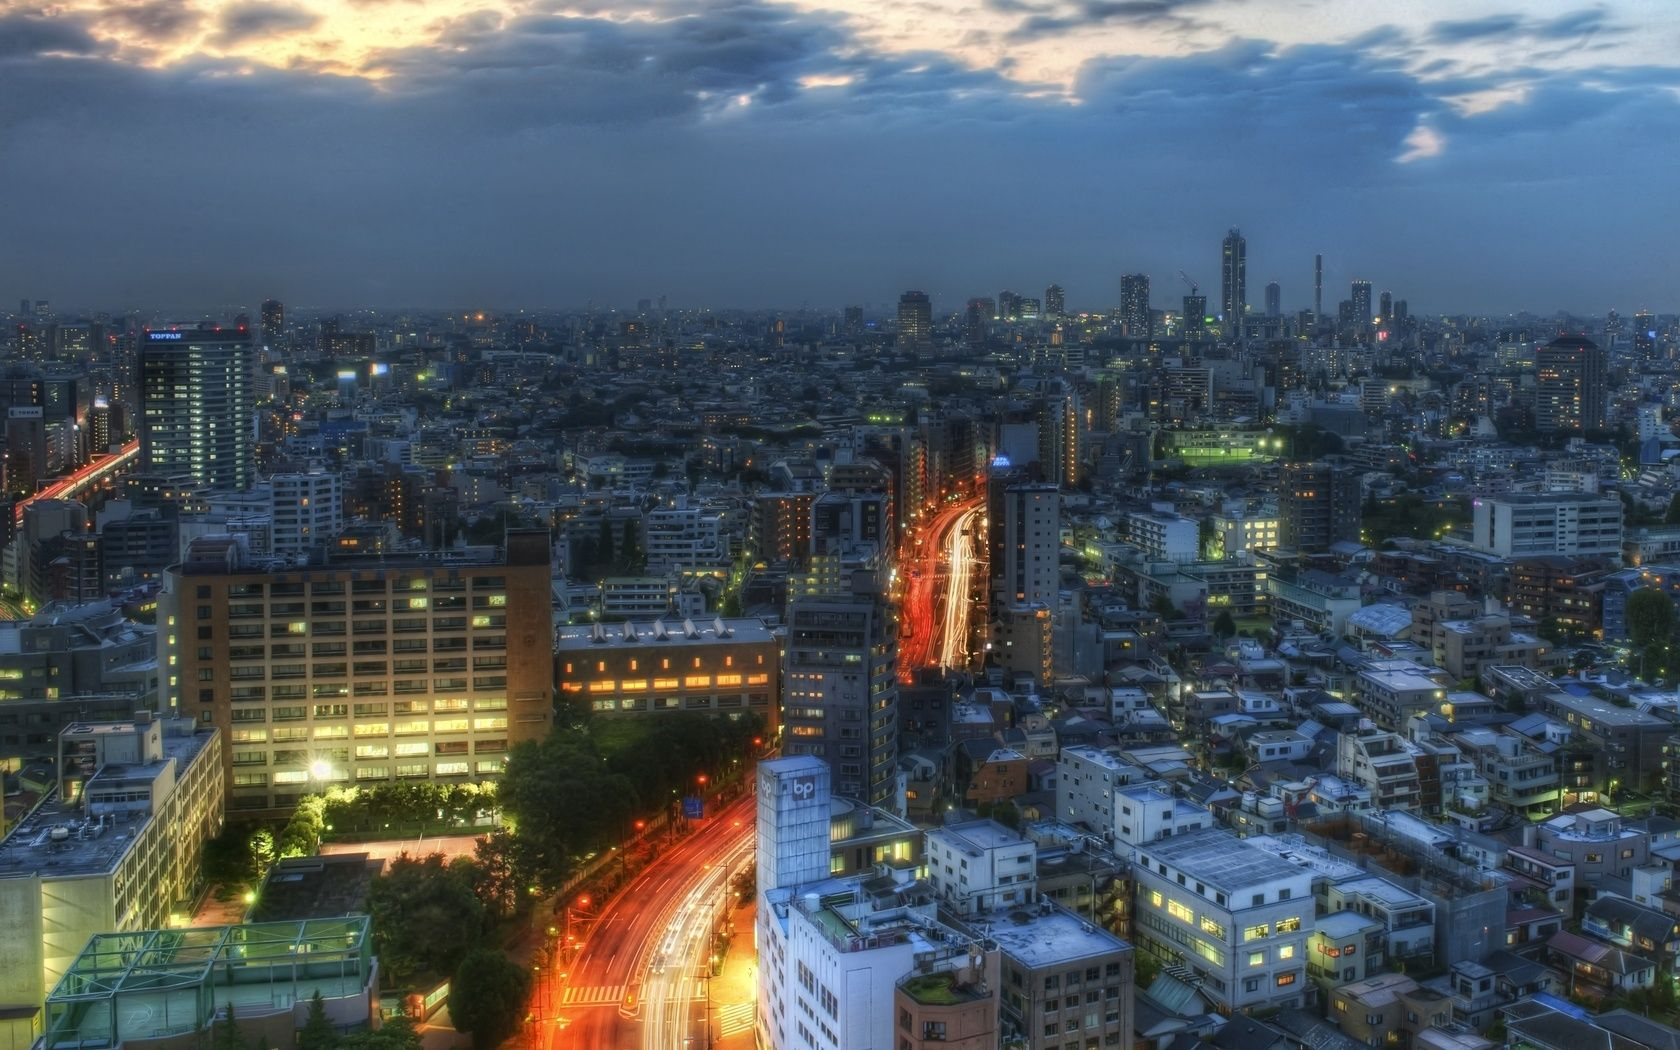 Tokyo Japan City Wallpapers - Top Free Tokyo Japan City Backgrounds